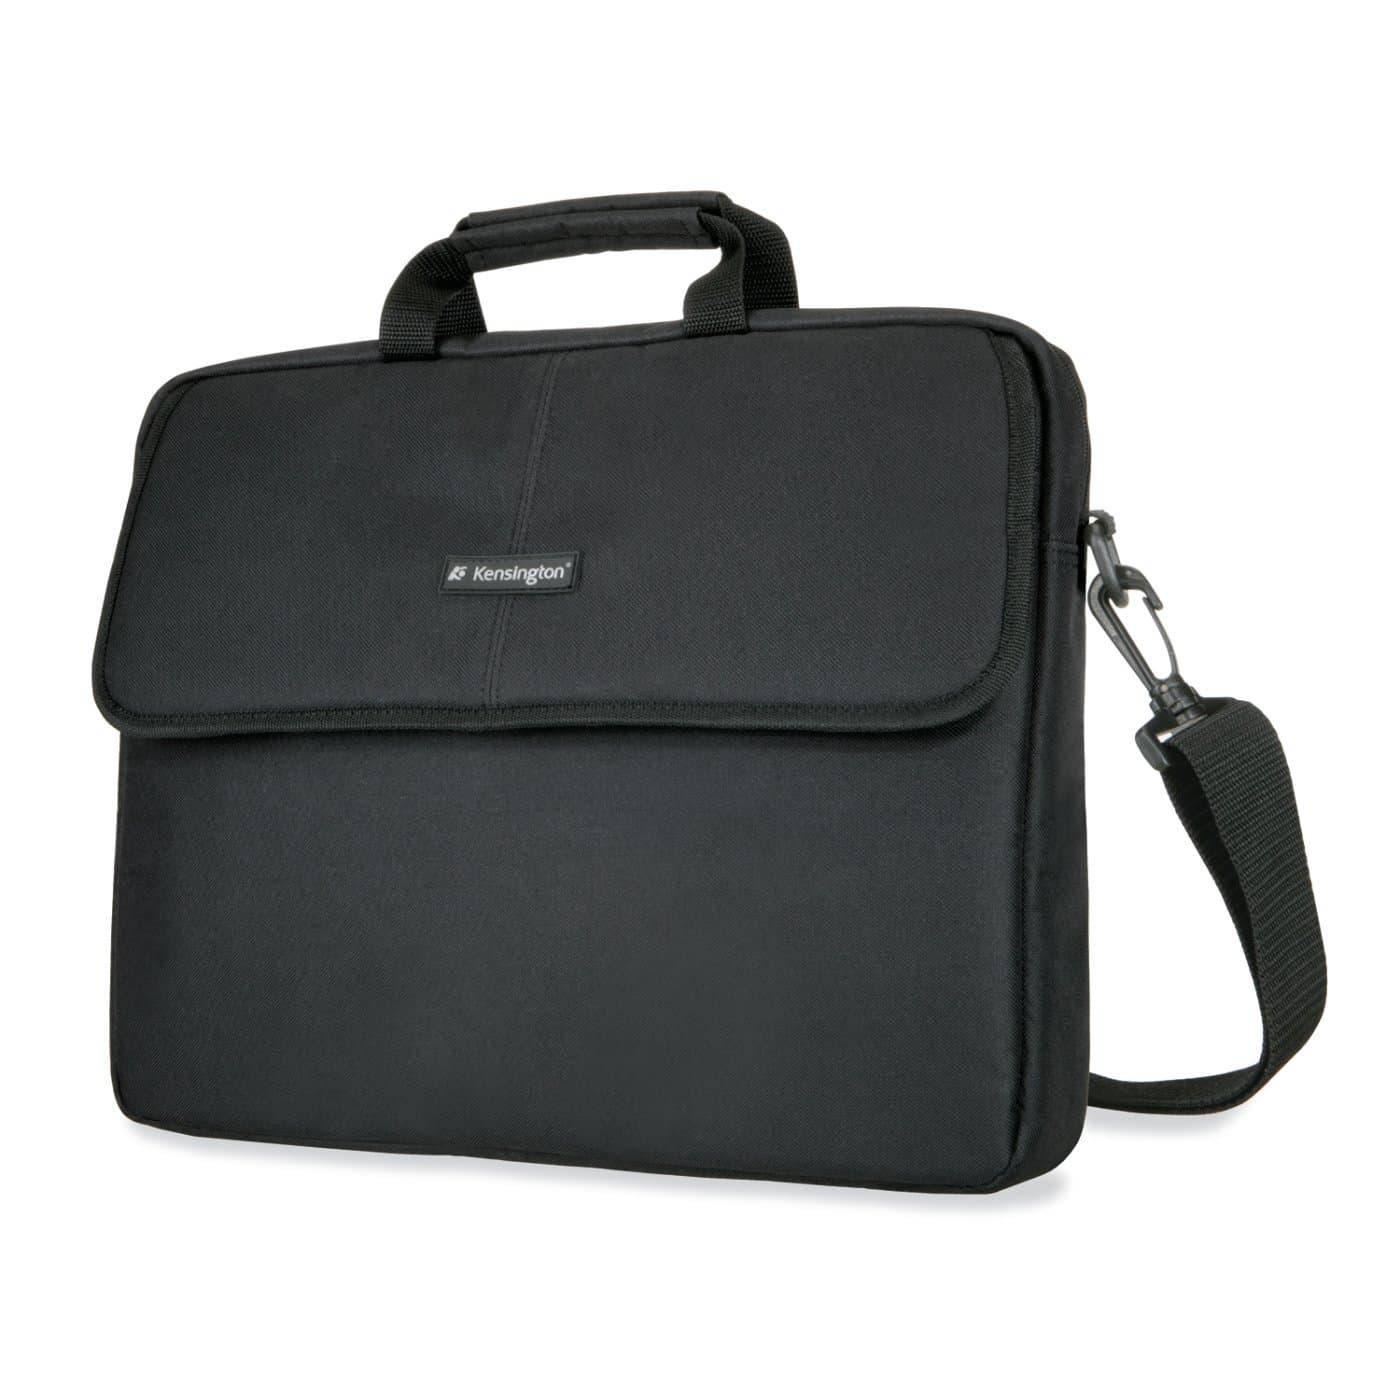 Kensington - Products - Laptop Bags - Simply Portable - SP17 Classic ... 255183677